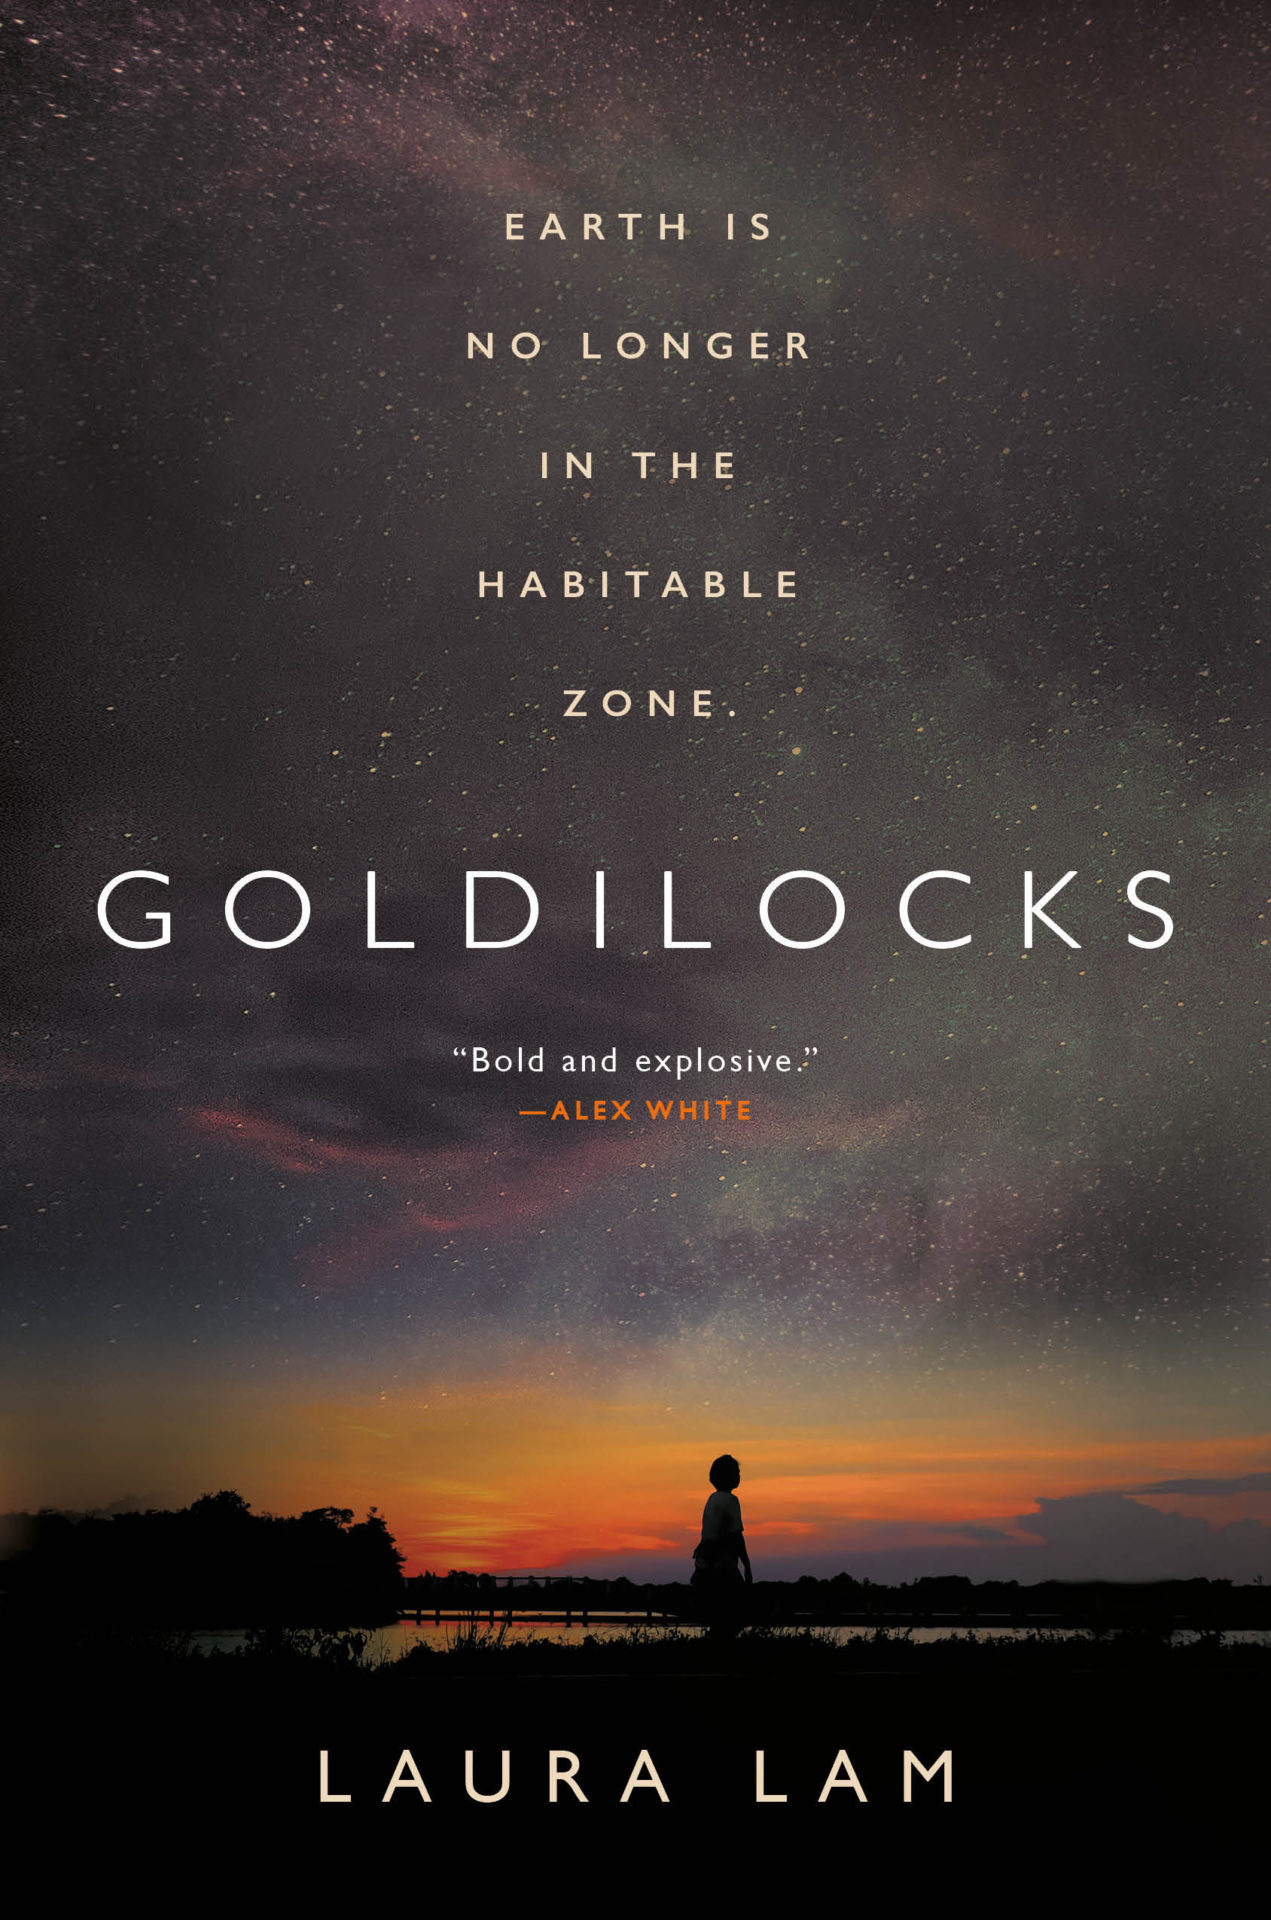 Goldilocks cover art